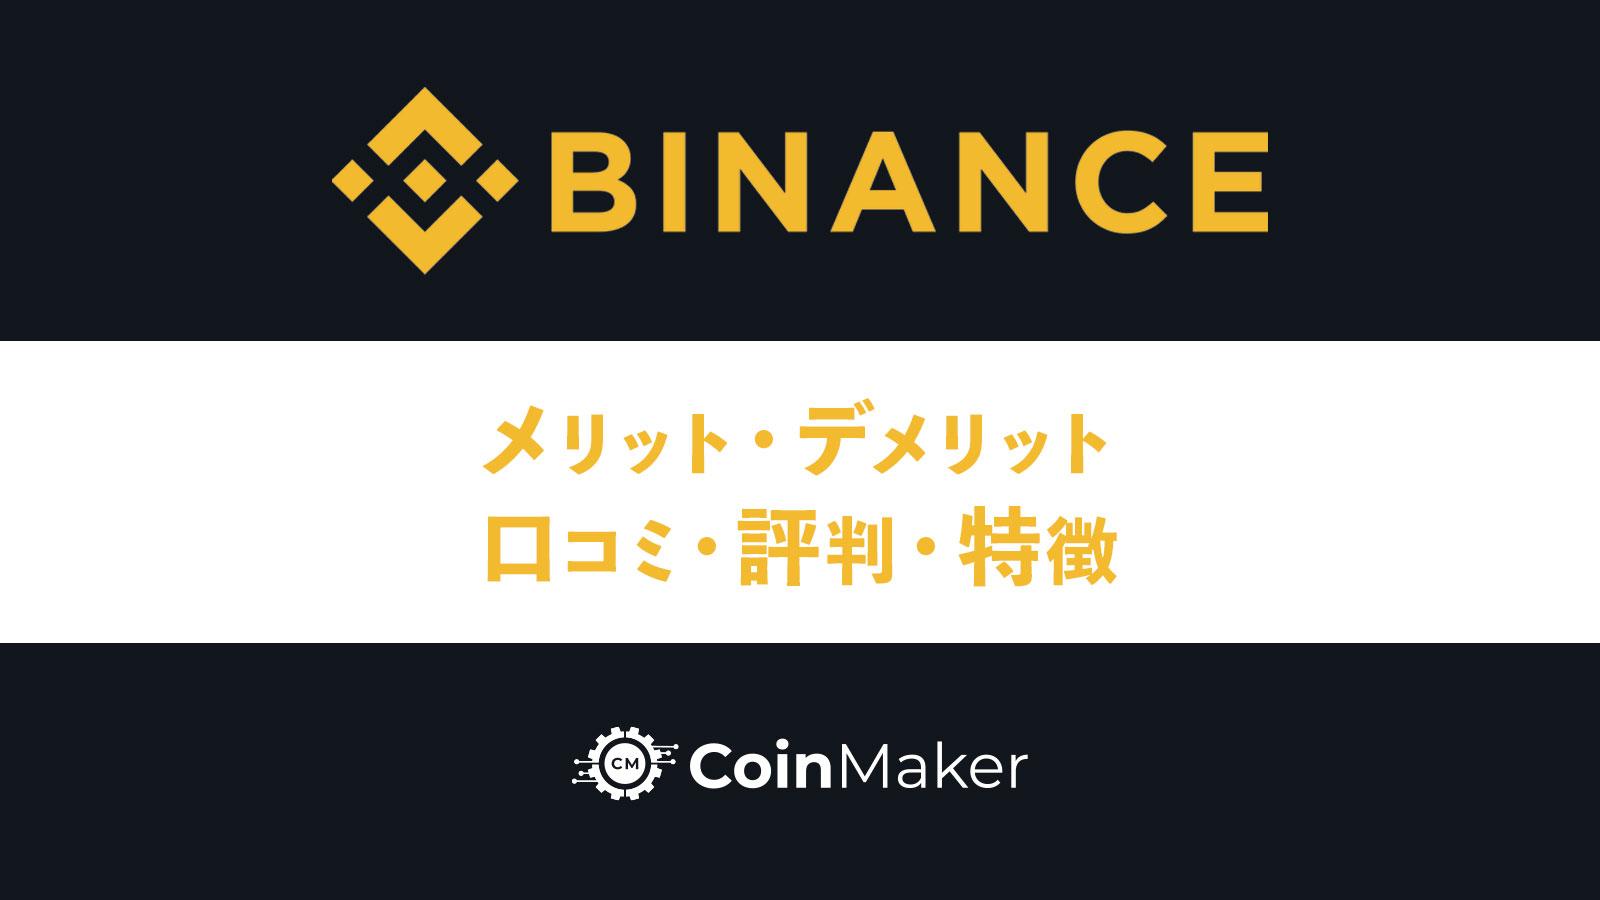 Binance(バイナンス)【世界最大の取引所】特徴・評判をわかりやすく解説